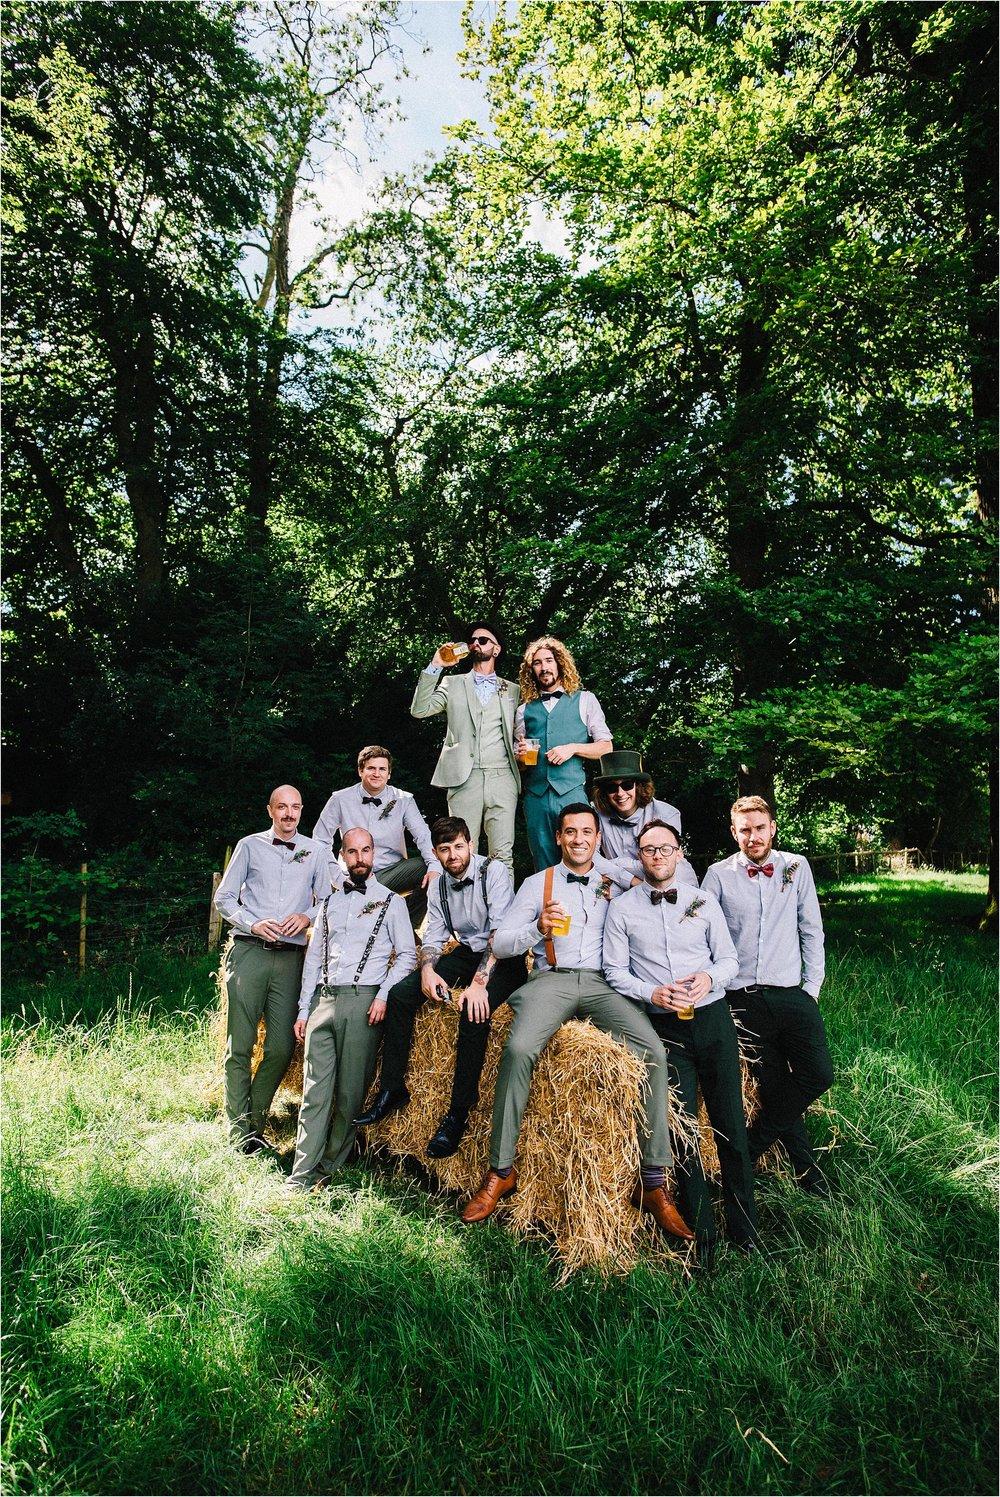 Milton Abbey Dorset Wedding Photographer_0117.jpg